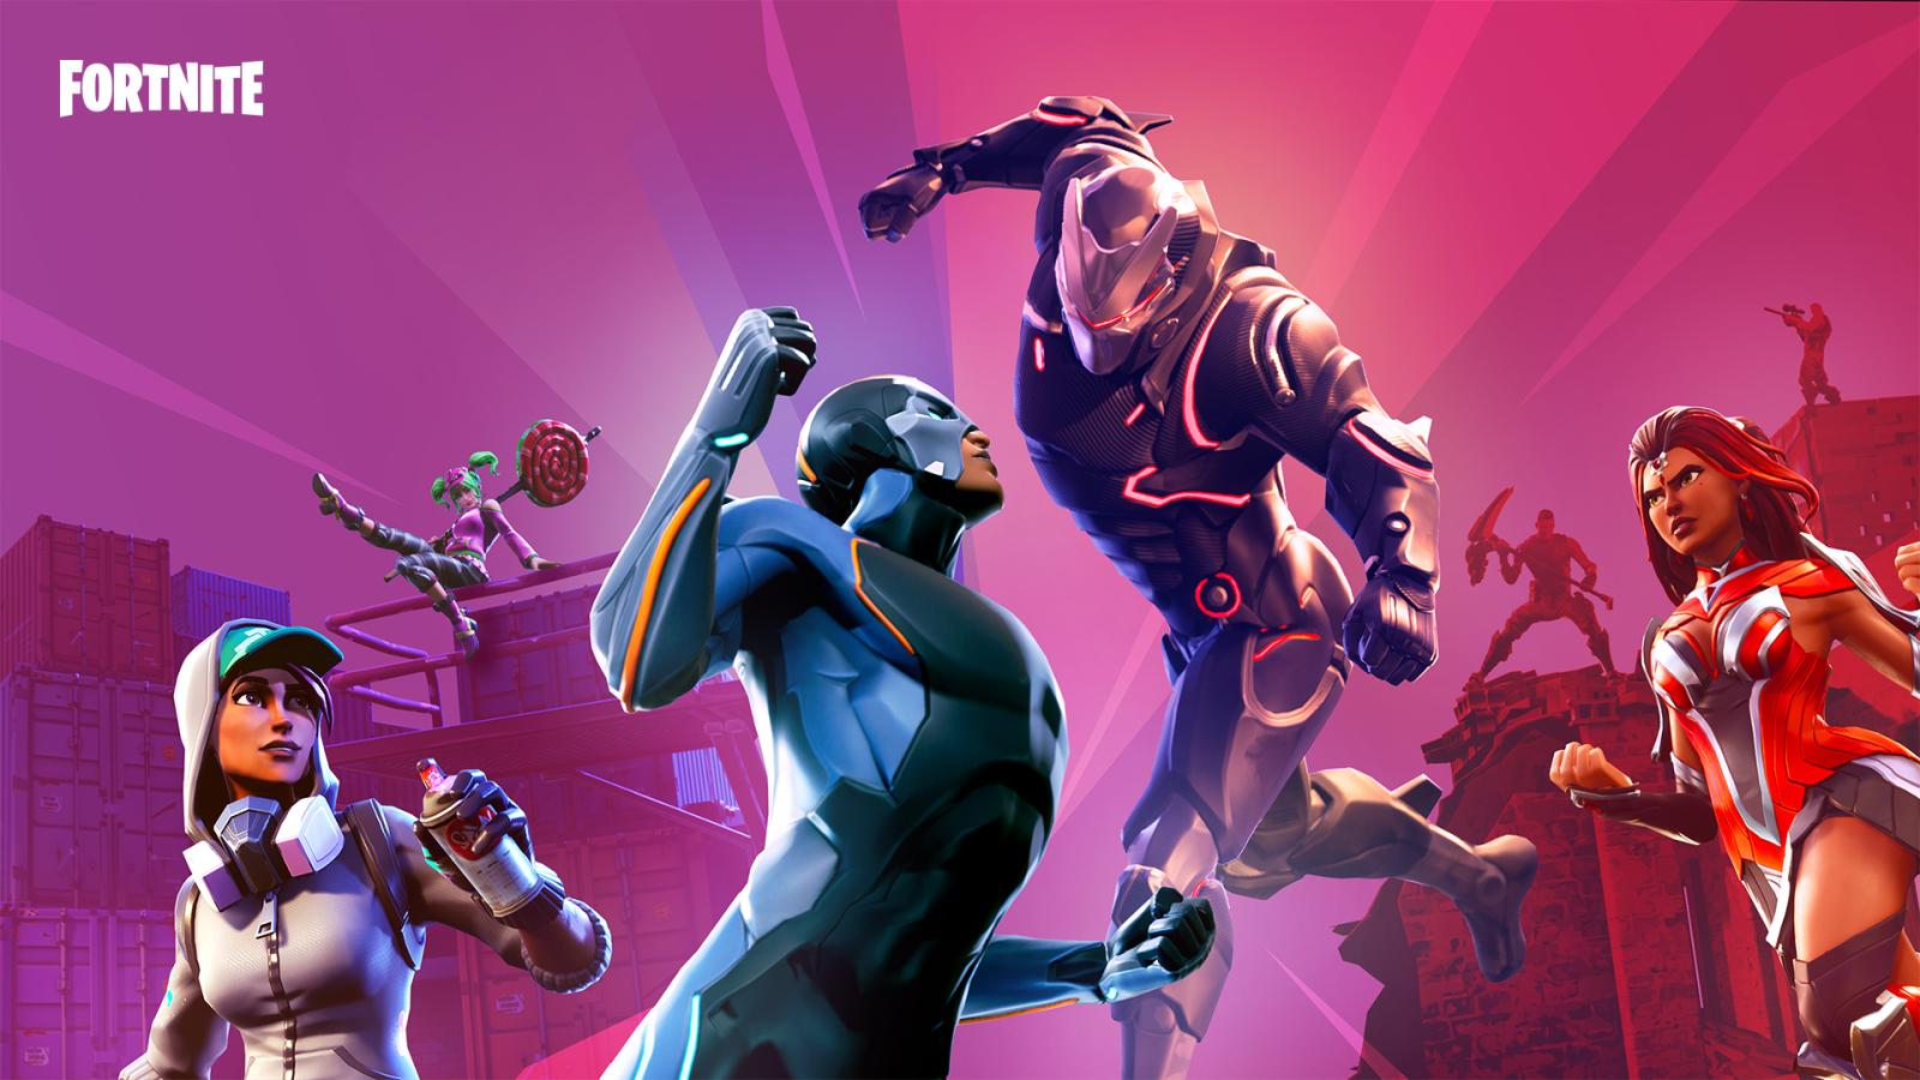 Fortnite Help Epic Games fortnite developer tim sweeney made $7 billion this year